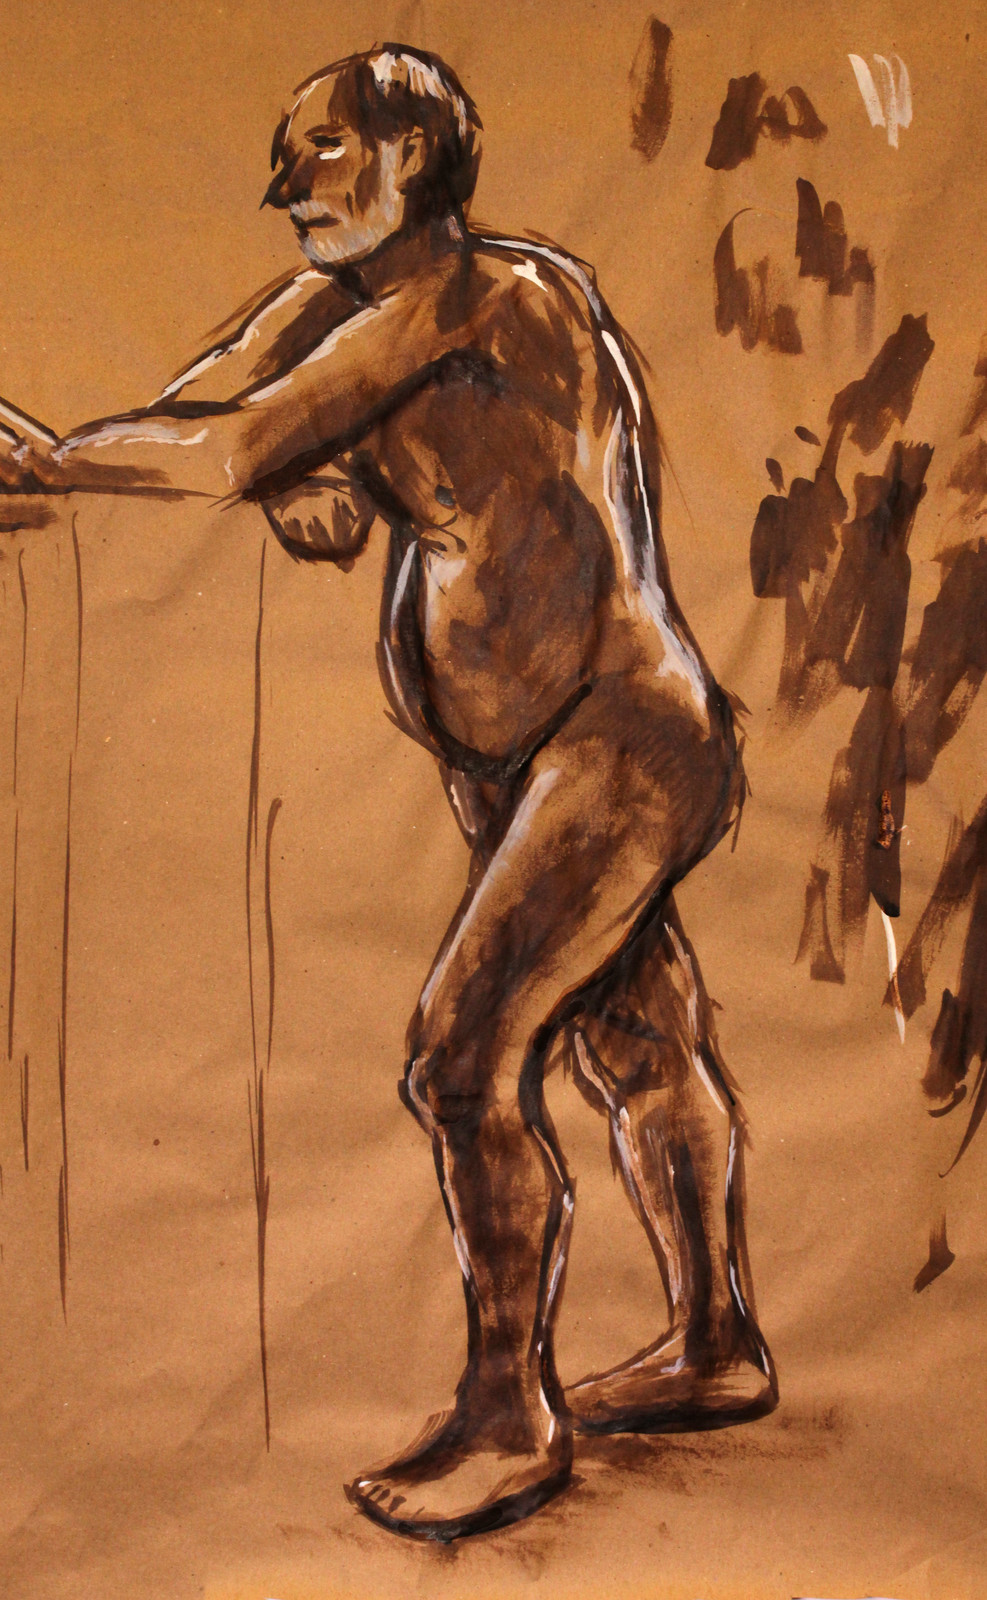 Sepia tone ink drawing of man